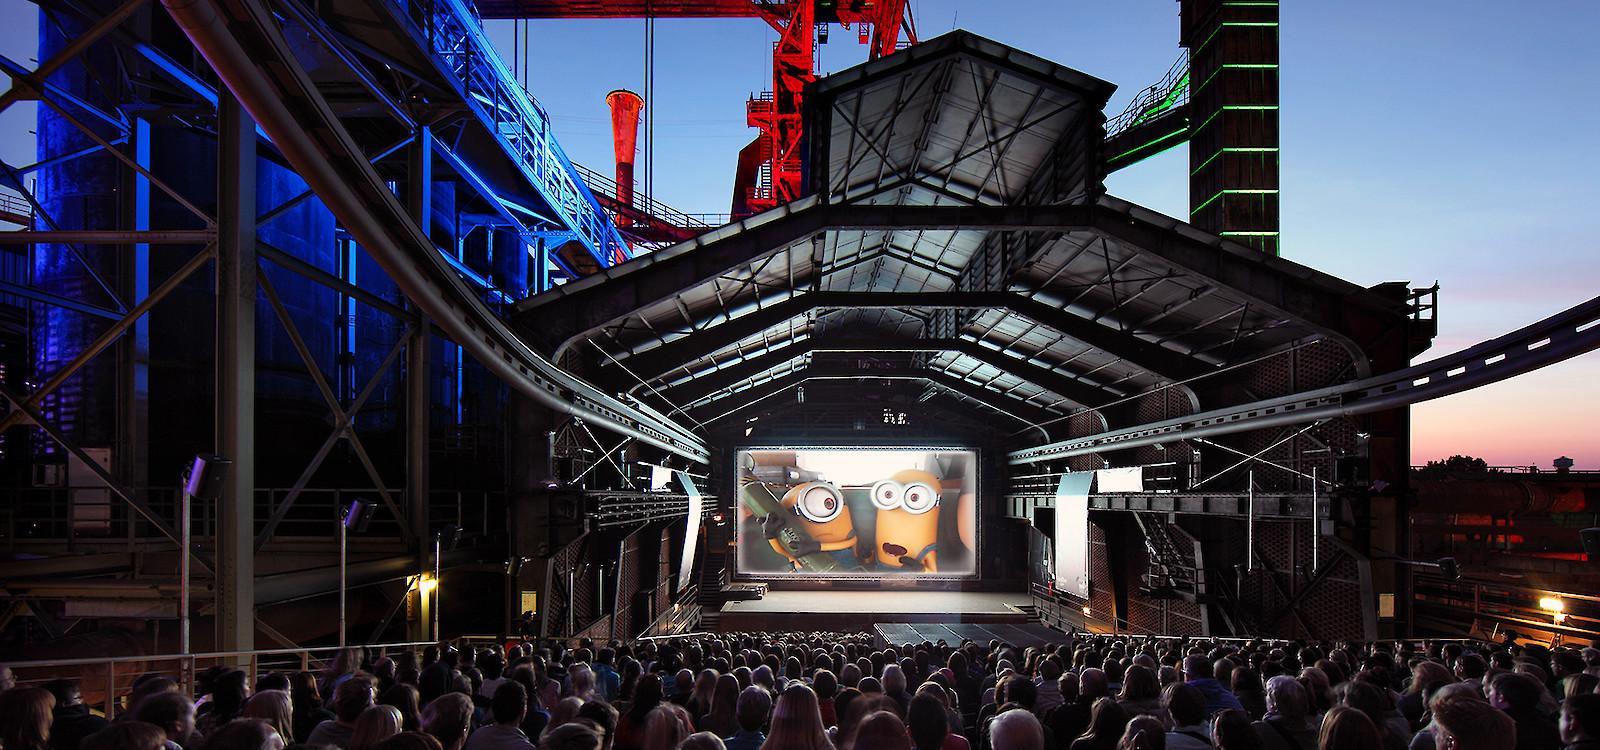 Duisburg Kino